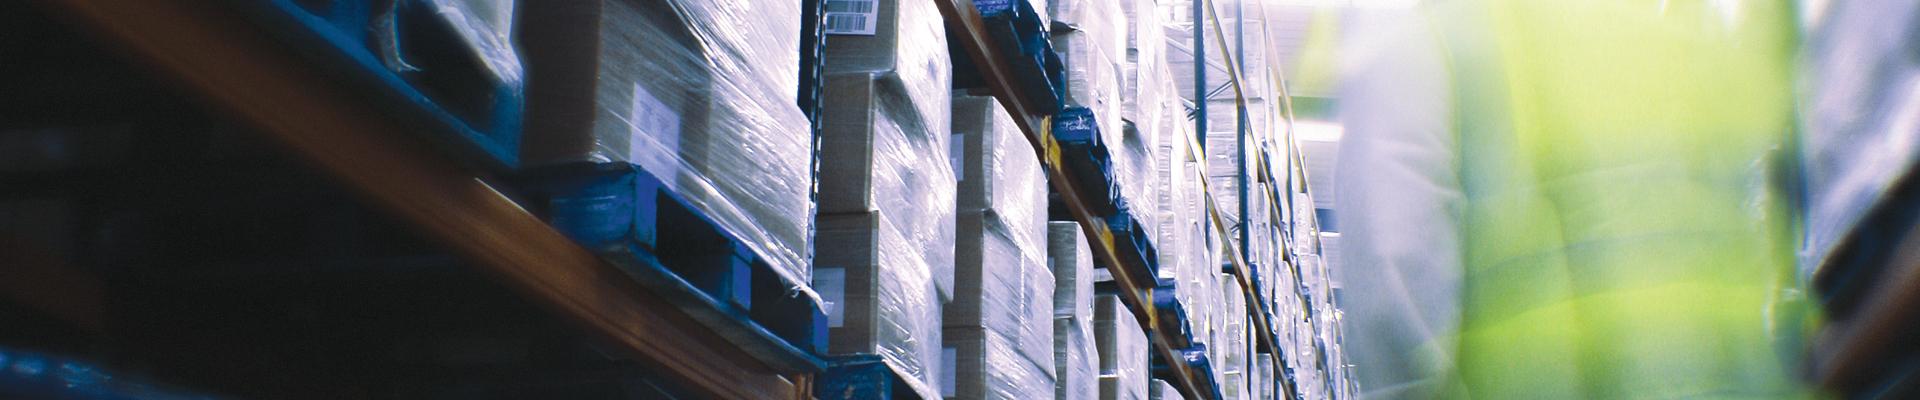 2-warehousing